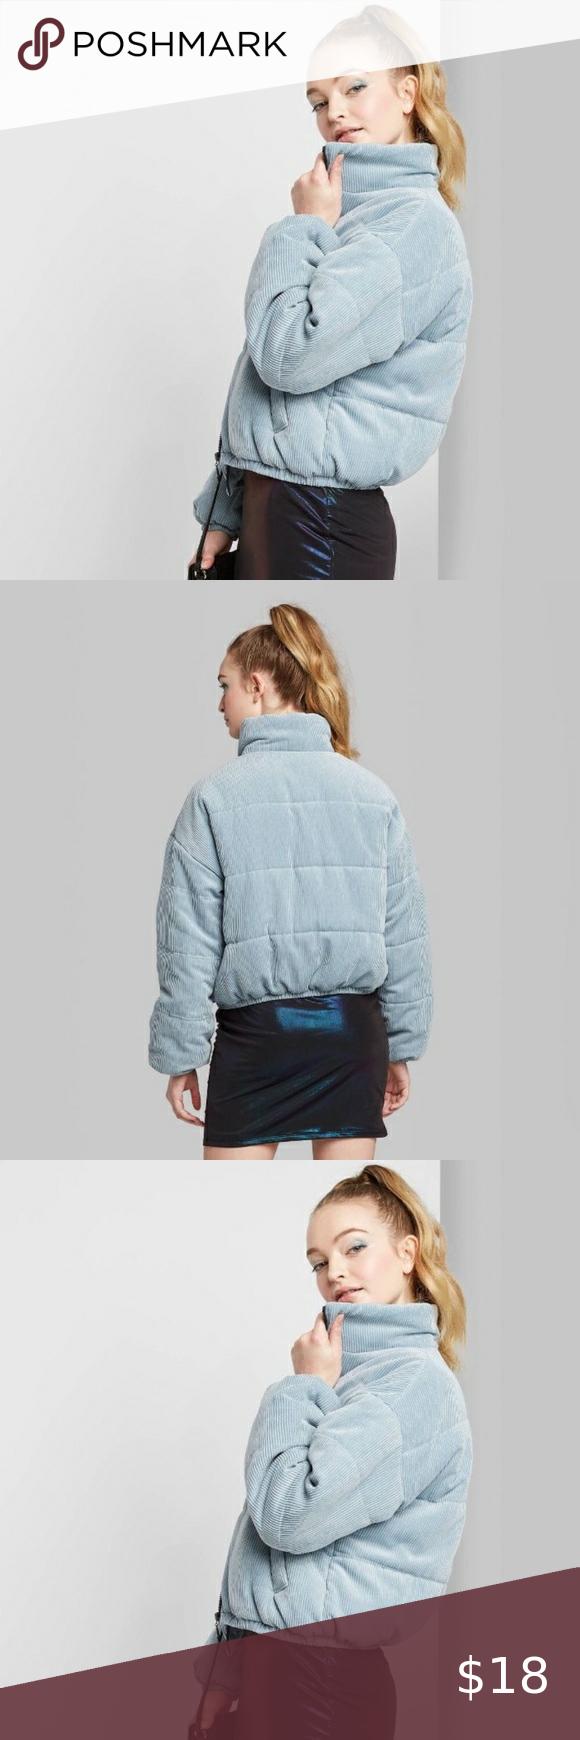 Wild Fable Blue Corduroy Bomber Puffer Jacket Xl Clothes Design Fashion Fashion Trends [ 1740 x 580 Pixel ]